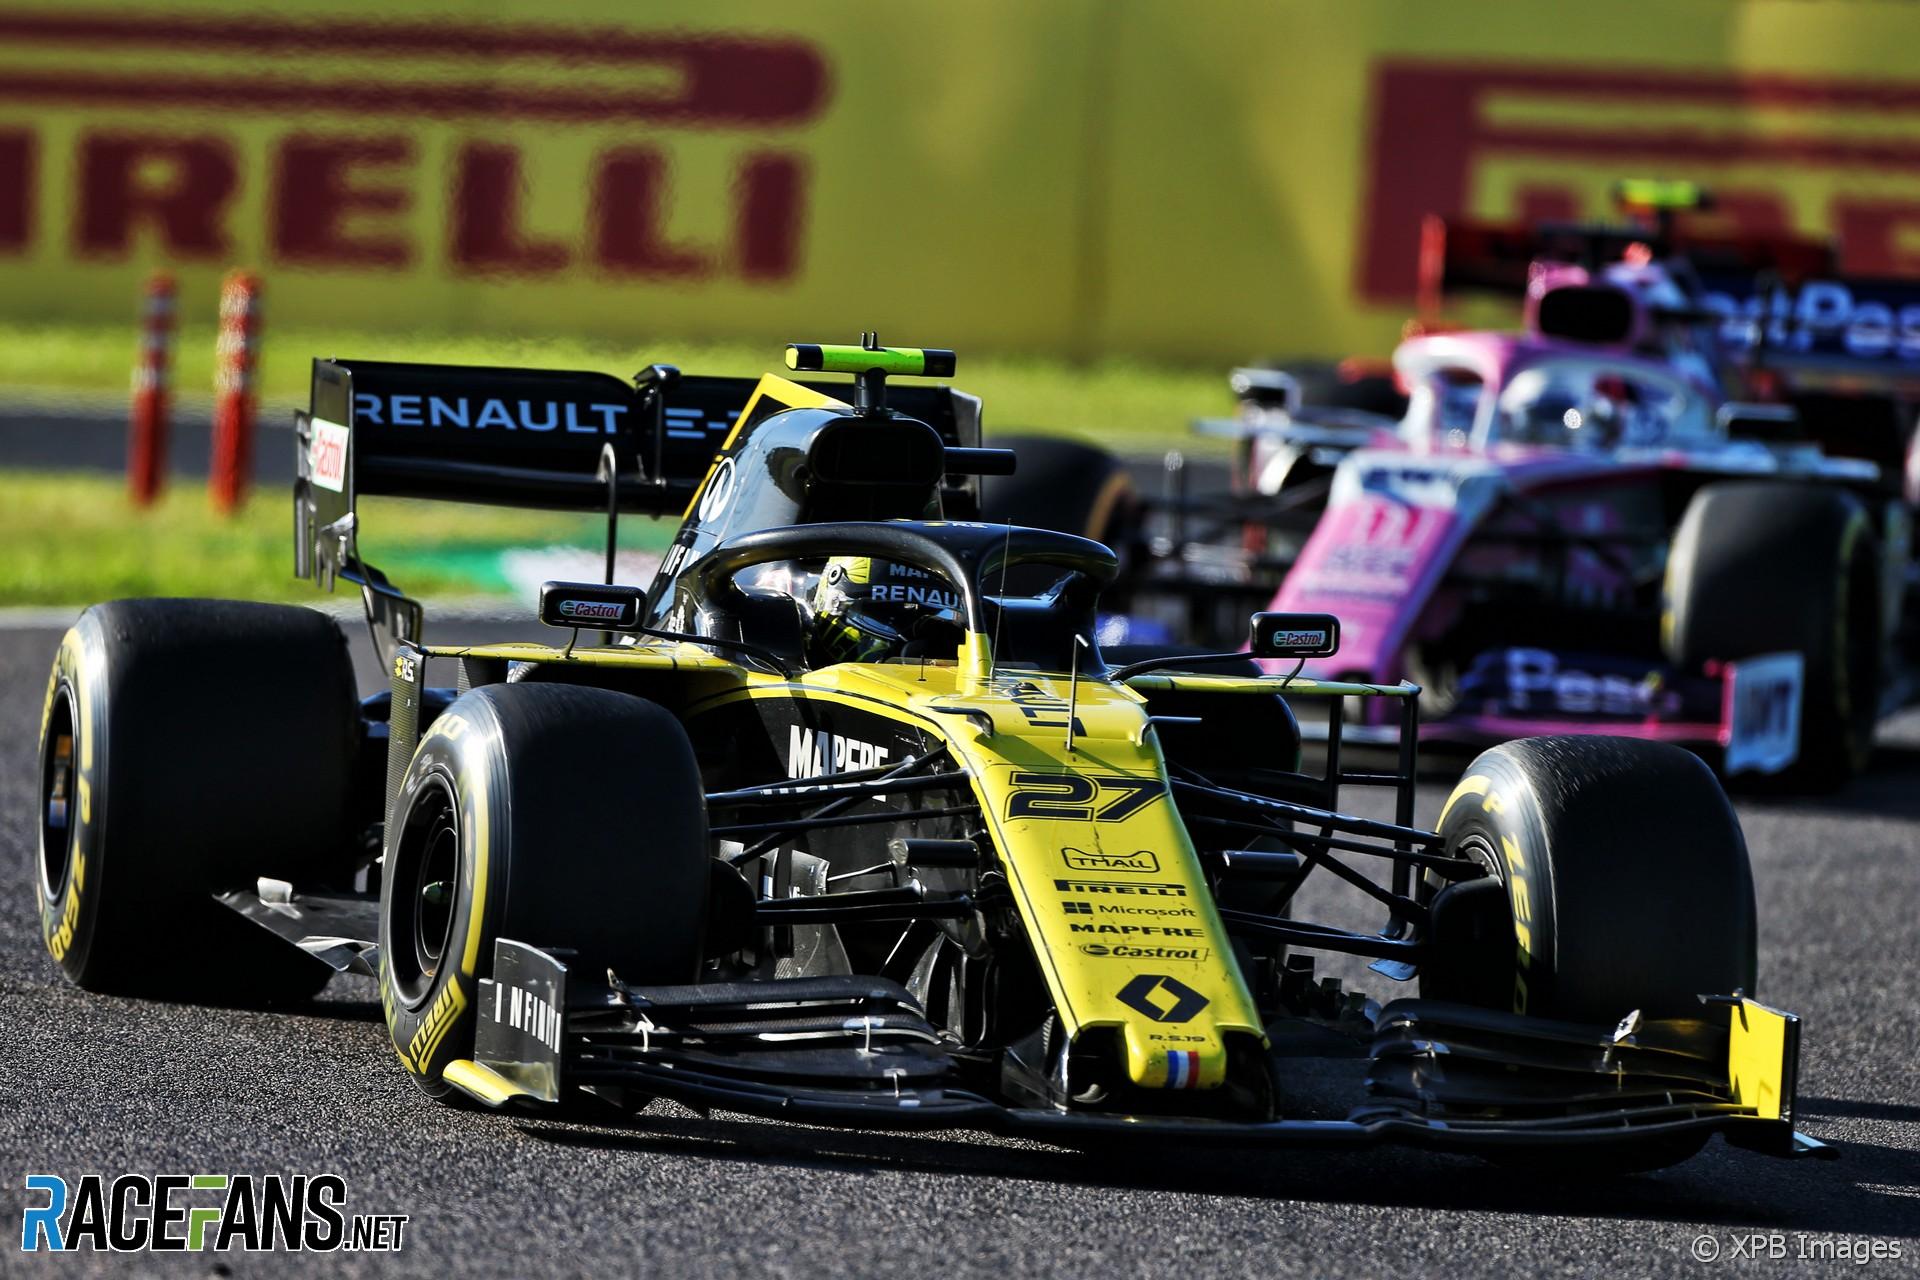 Nico Hulkenberg, Renault, Suzuka, 2019